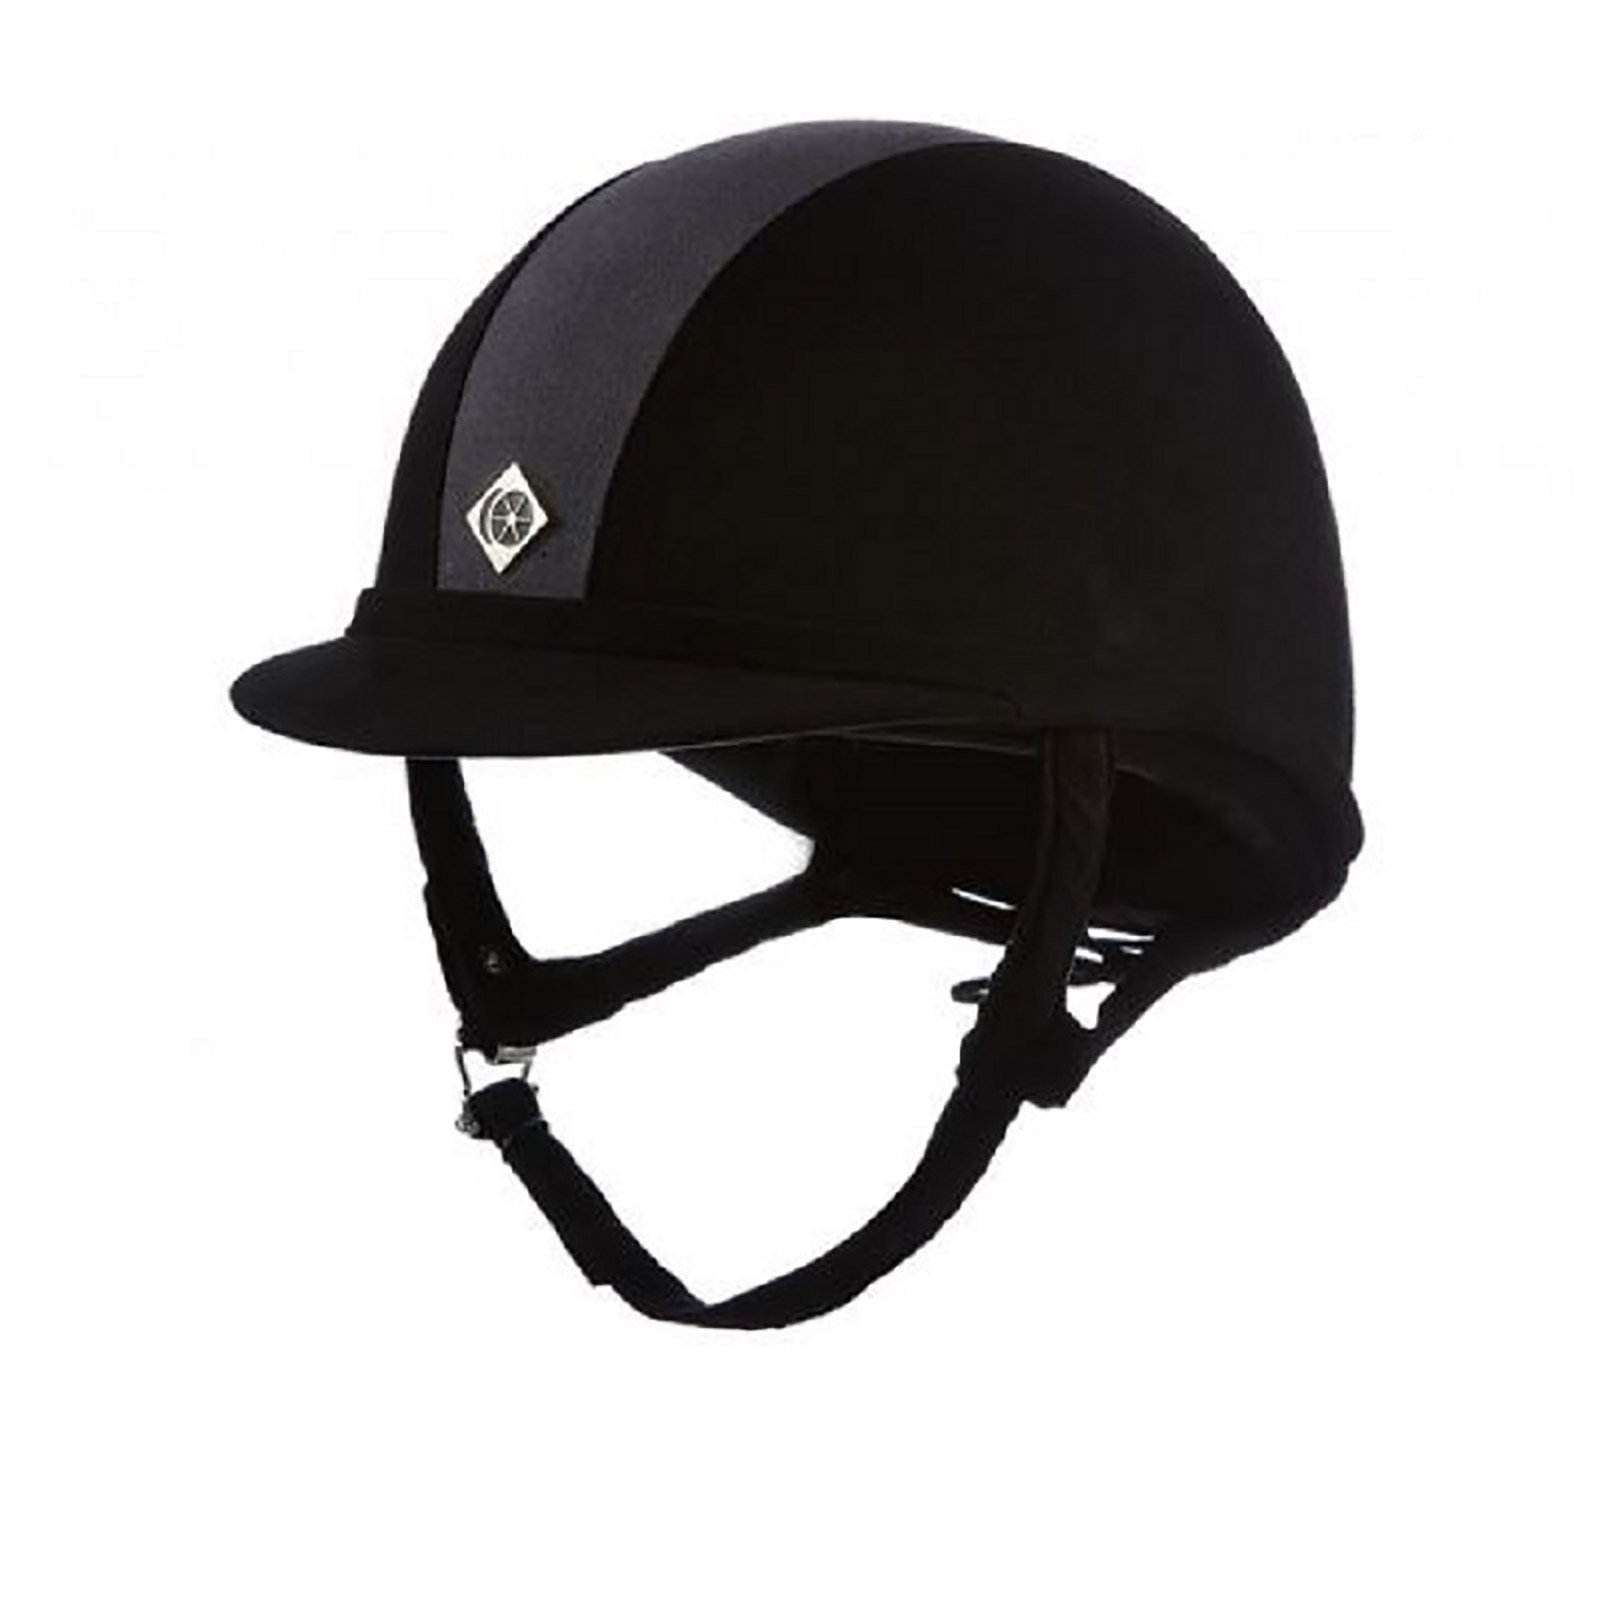 Charles Owen GR8 Riding Hat Black/Charcoal 64cm